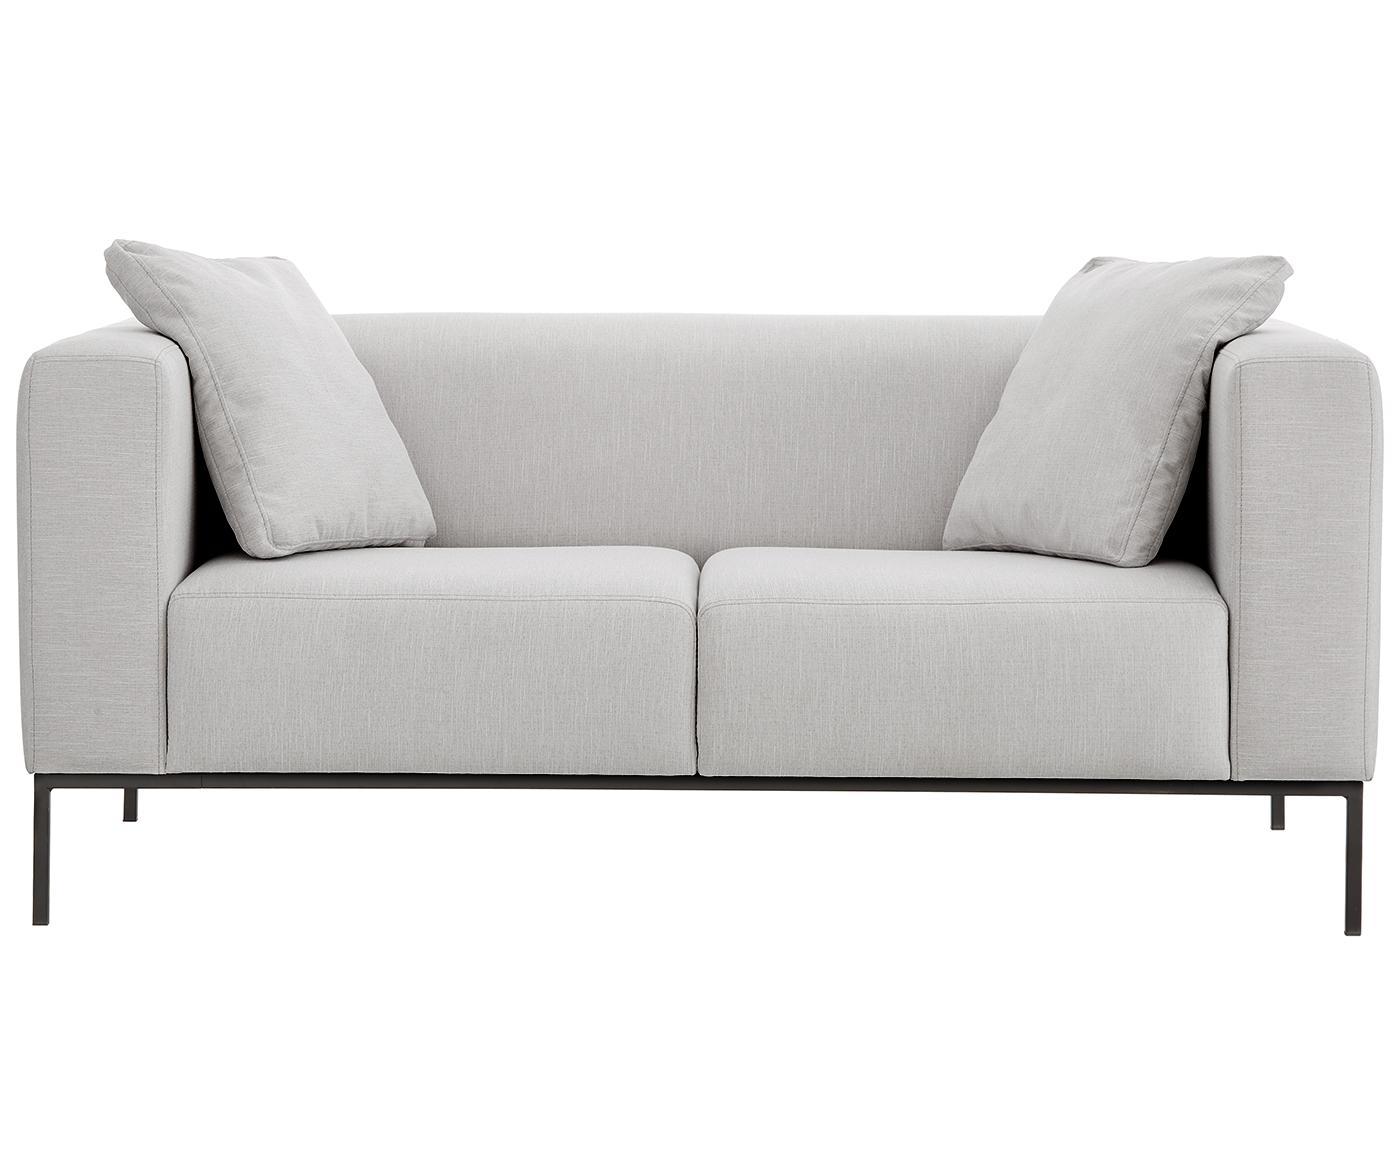 Bank Carrie (2-zits), Bekleding: polyester, Frame: spaanplaat, hardboard, mu, Poten: gelakt metaal, Webstoff Grau, B 176 x D 86 cm